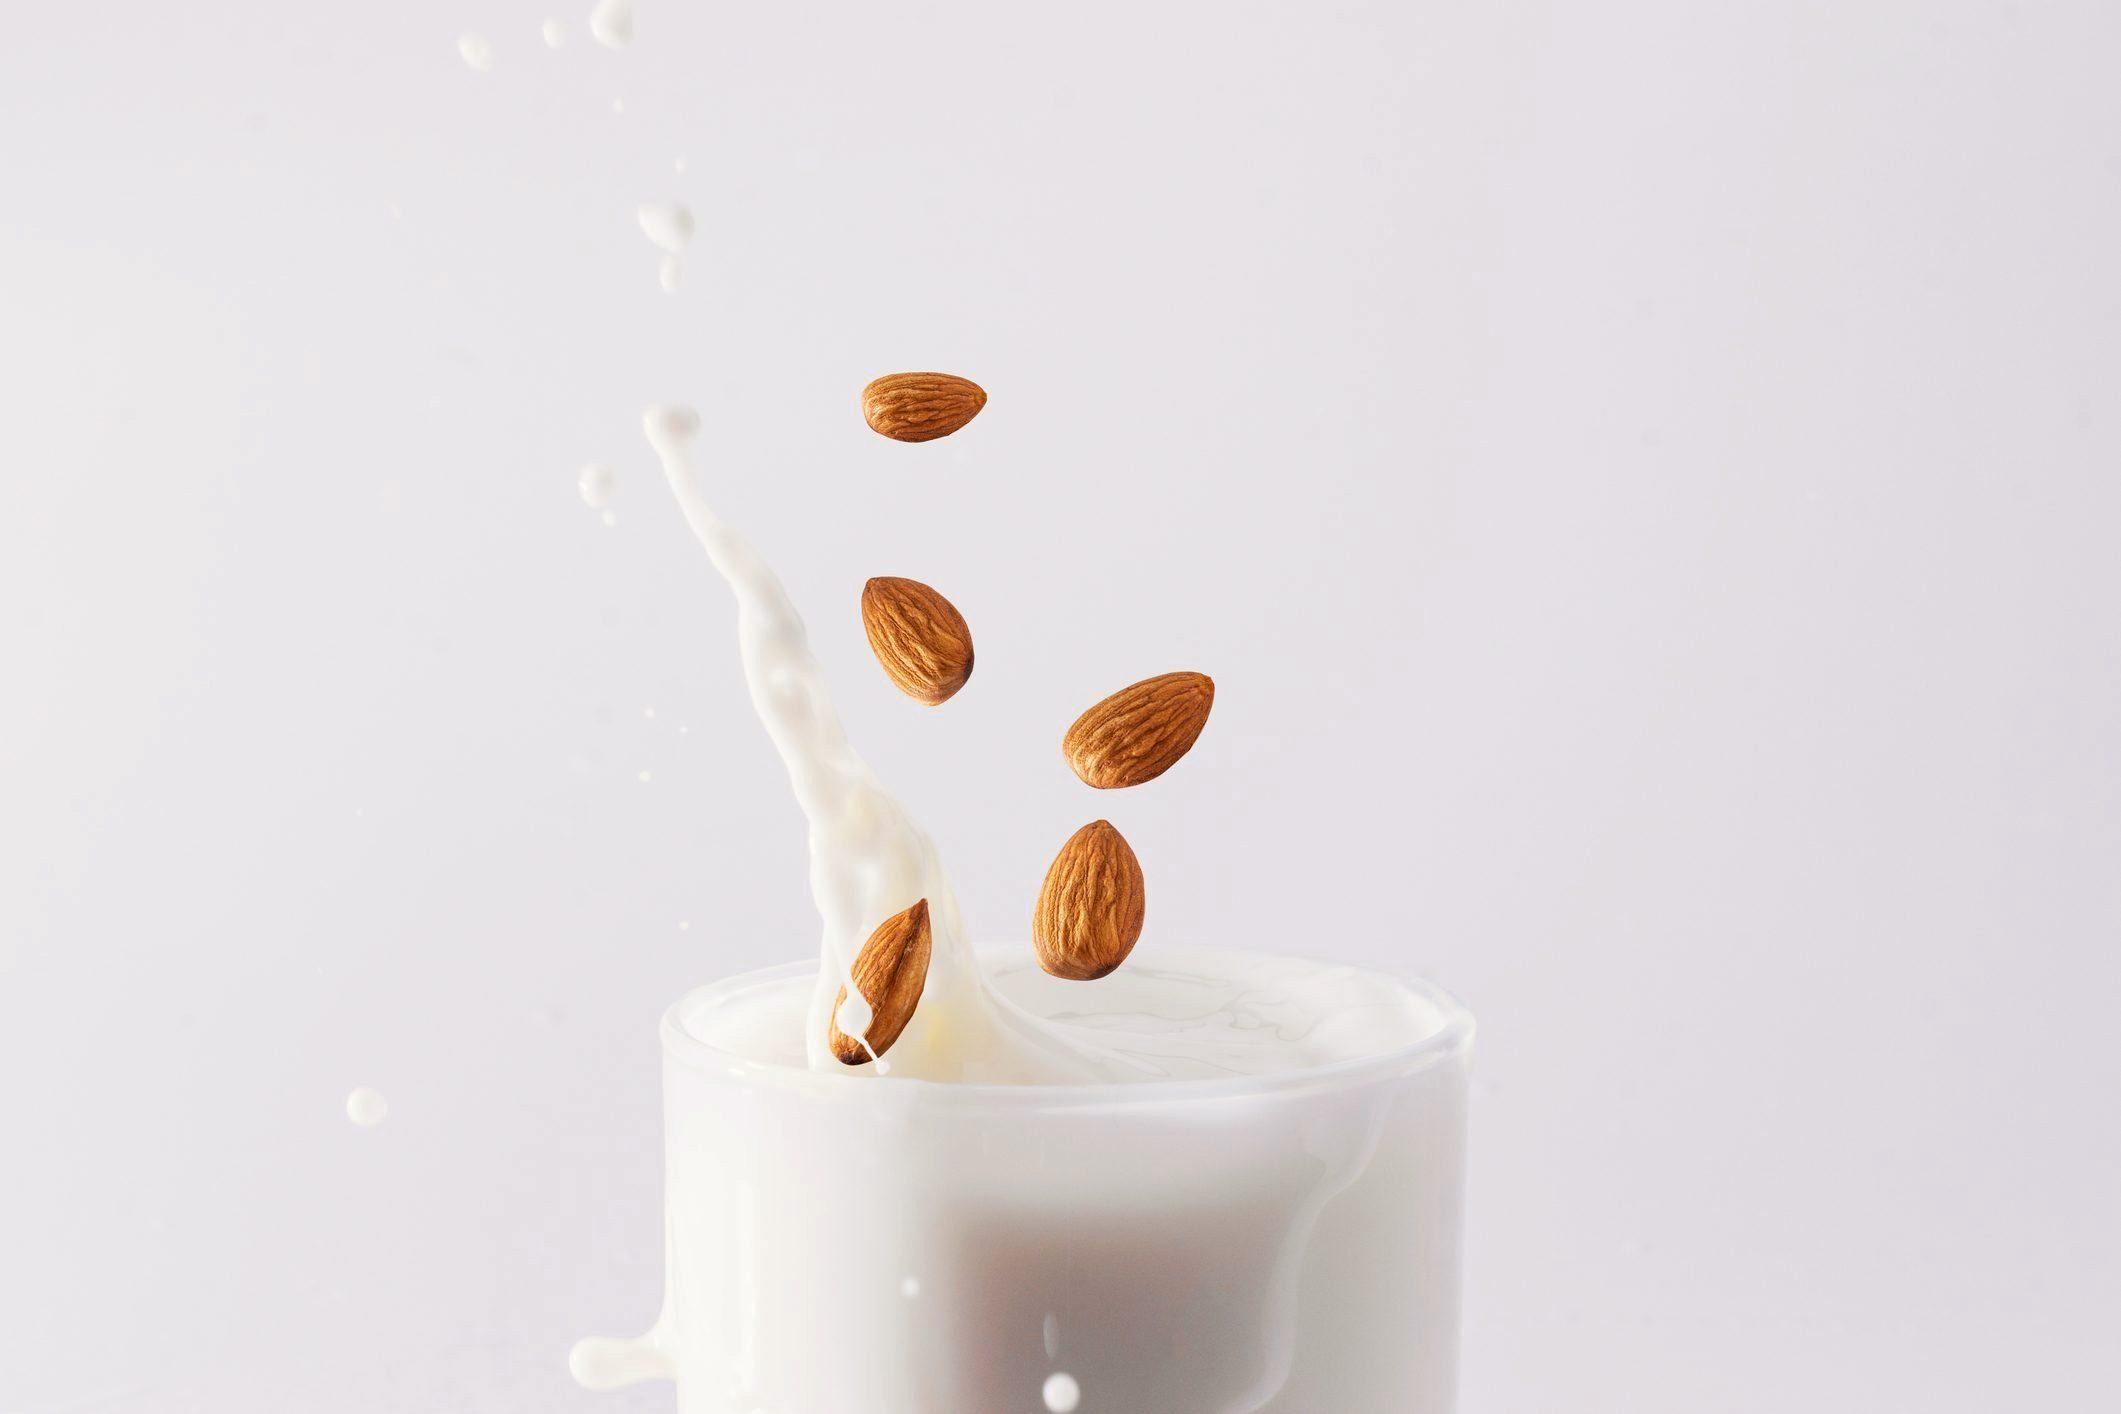 is almond milk good for you? | almonds splashing in milk